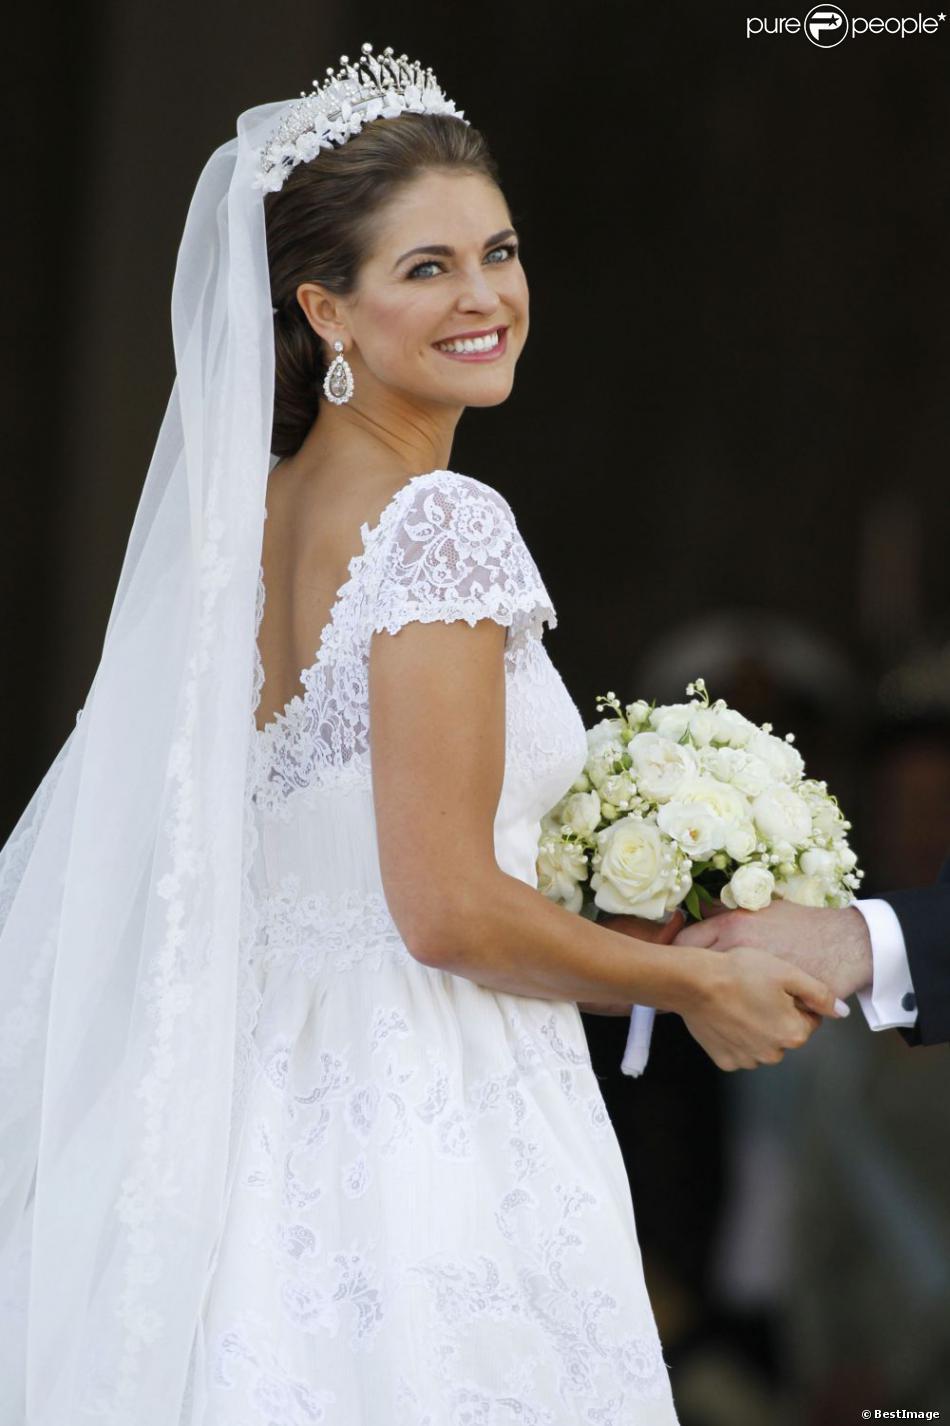 Mariage de la princesse madeleine sa robe de mari e for Code de robe de mariage de palais de justice